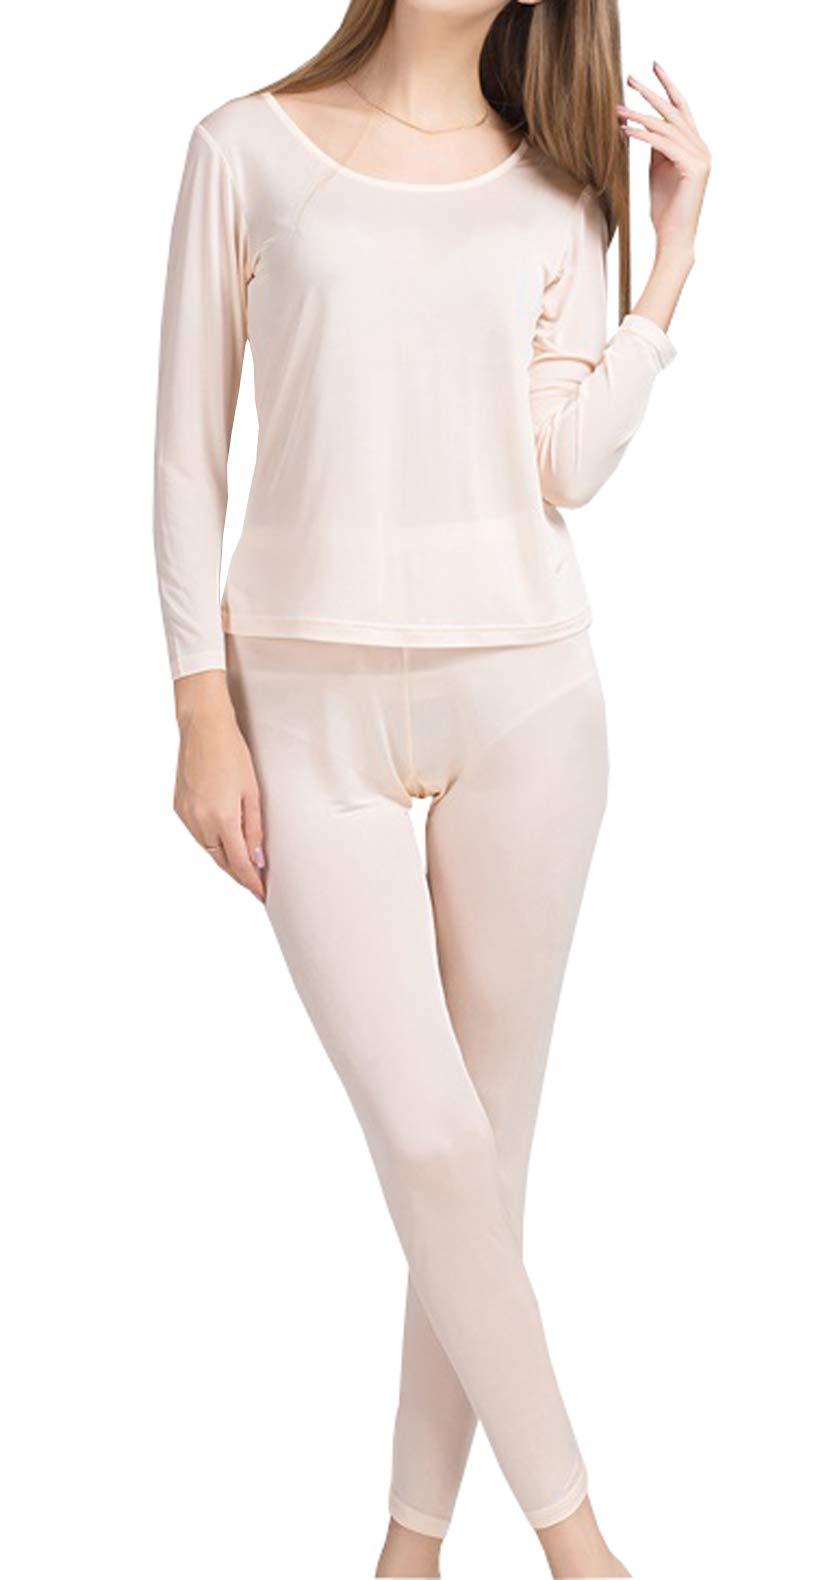 METWAY Women's Silk Long Johns |Silk Thermal Underwear Sets|Winter Silk Long Underwear (Small, Fleshcolor) by METWAY